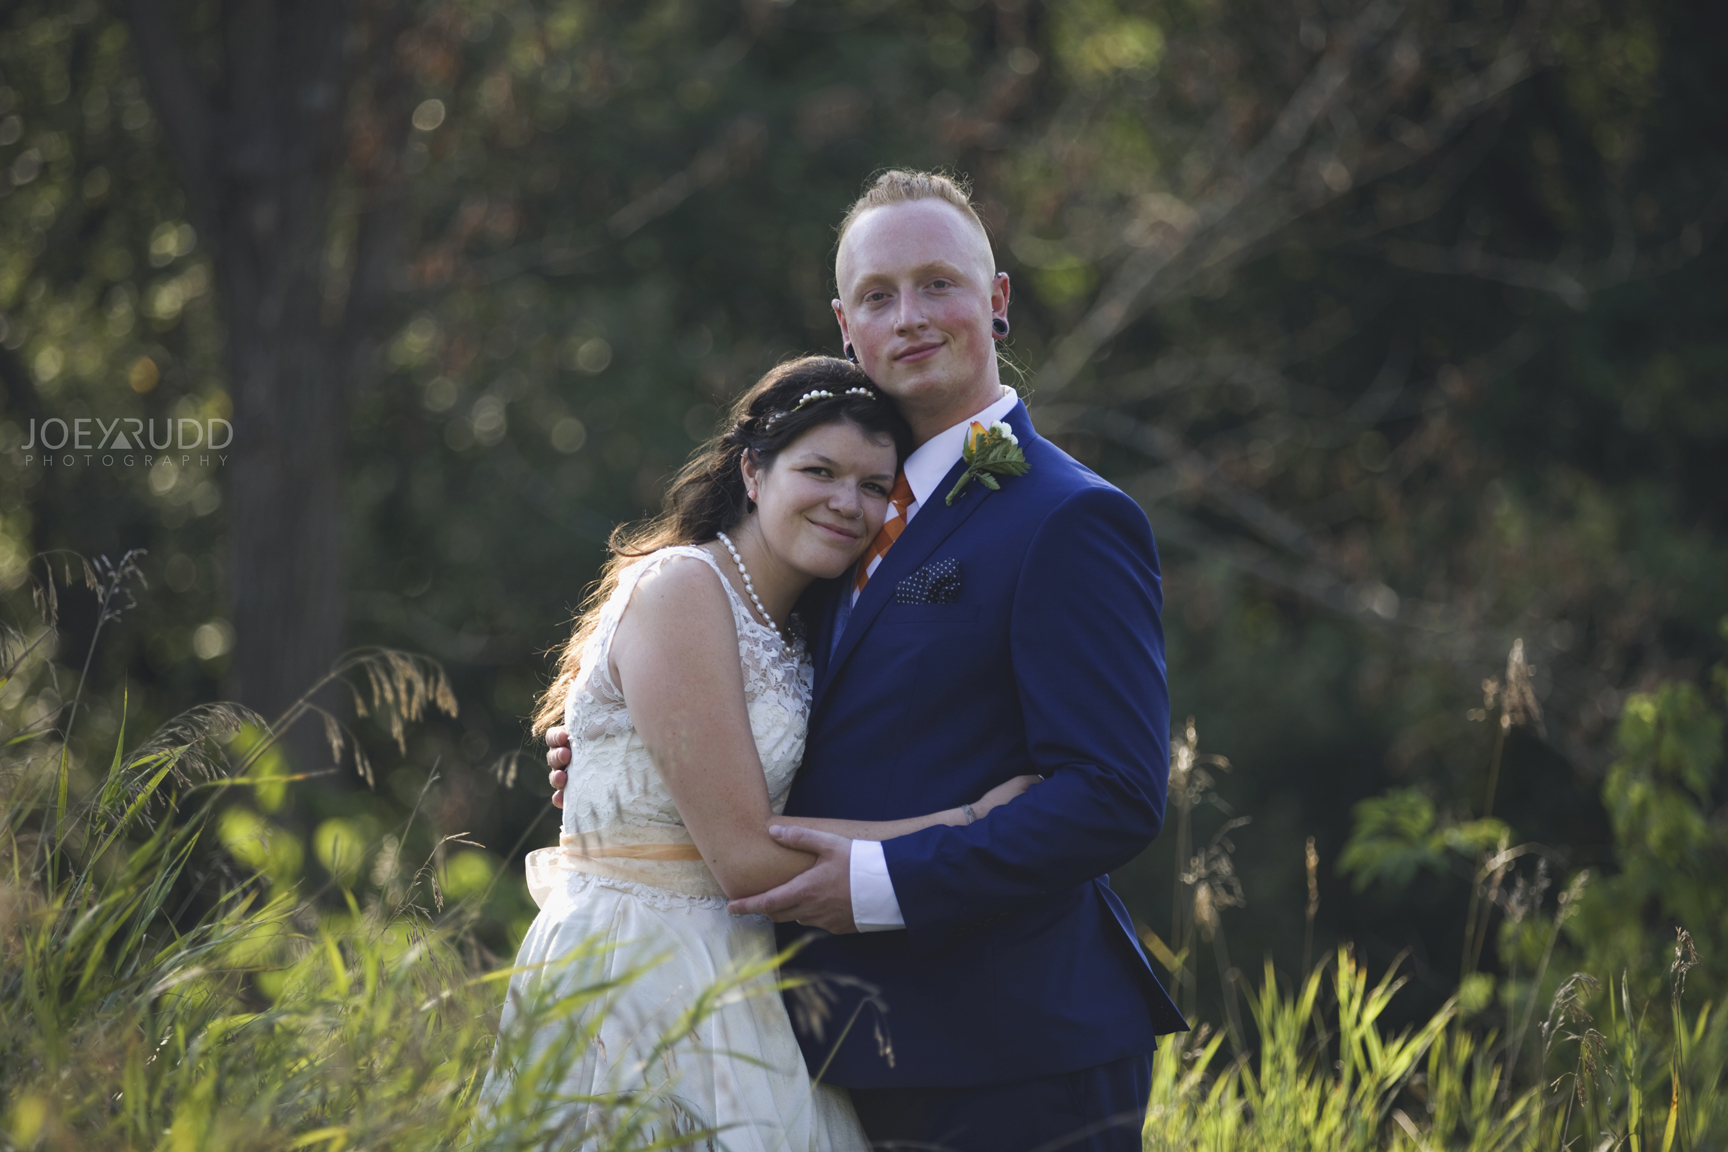 Backyard Kingston Wedding by Ottawa Wedding Photographer Joey Rudd Photography Portrait